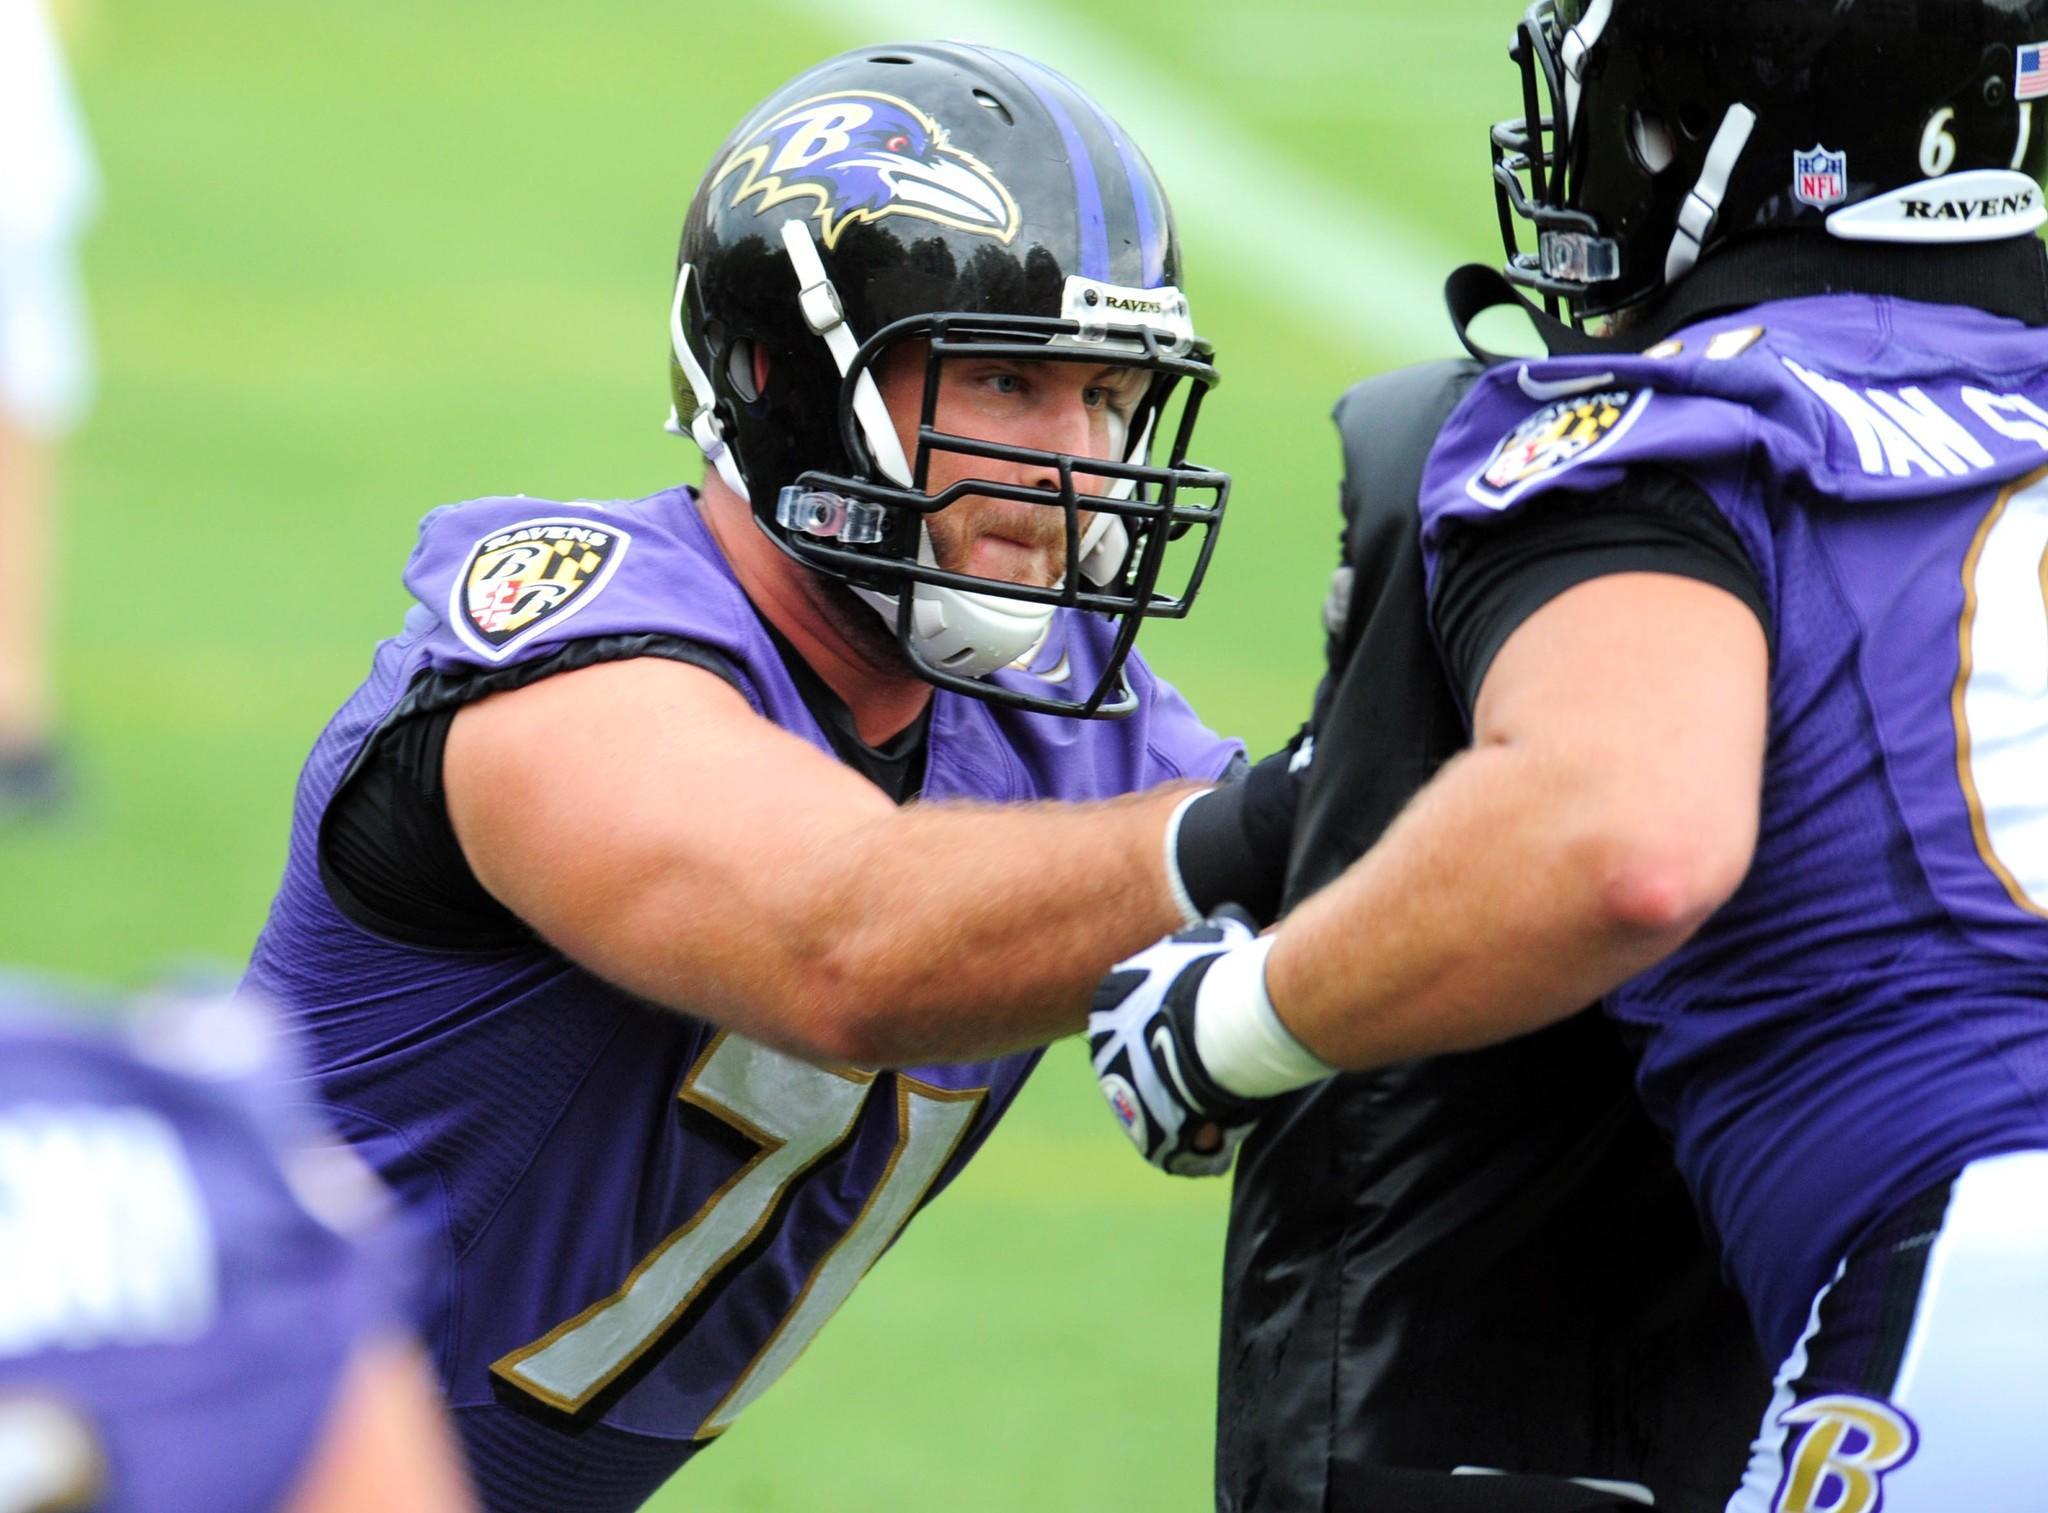 promise leads to football career for Ravens lineman Rick